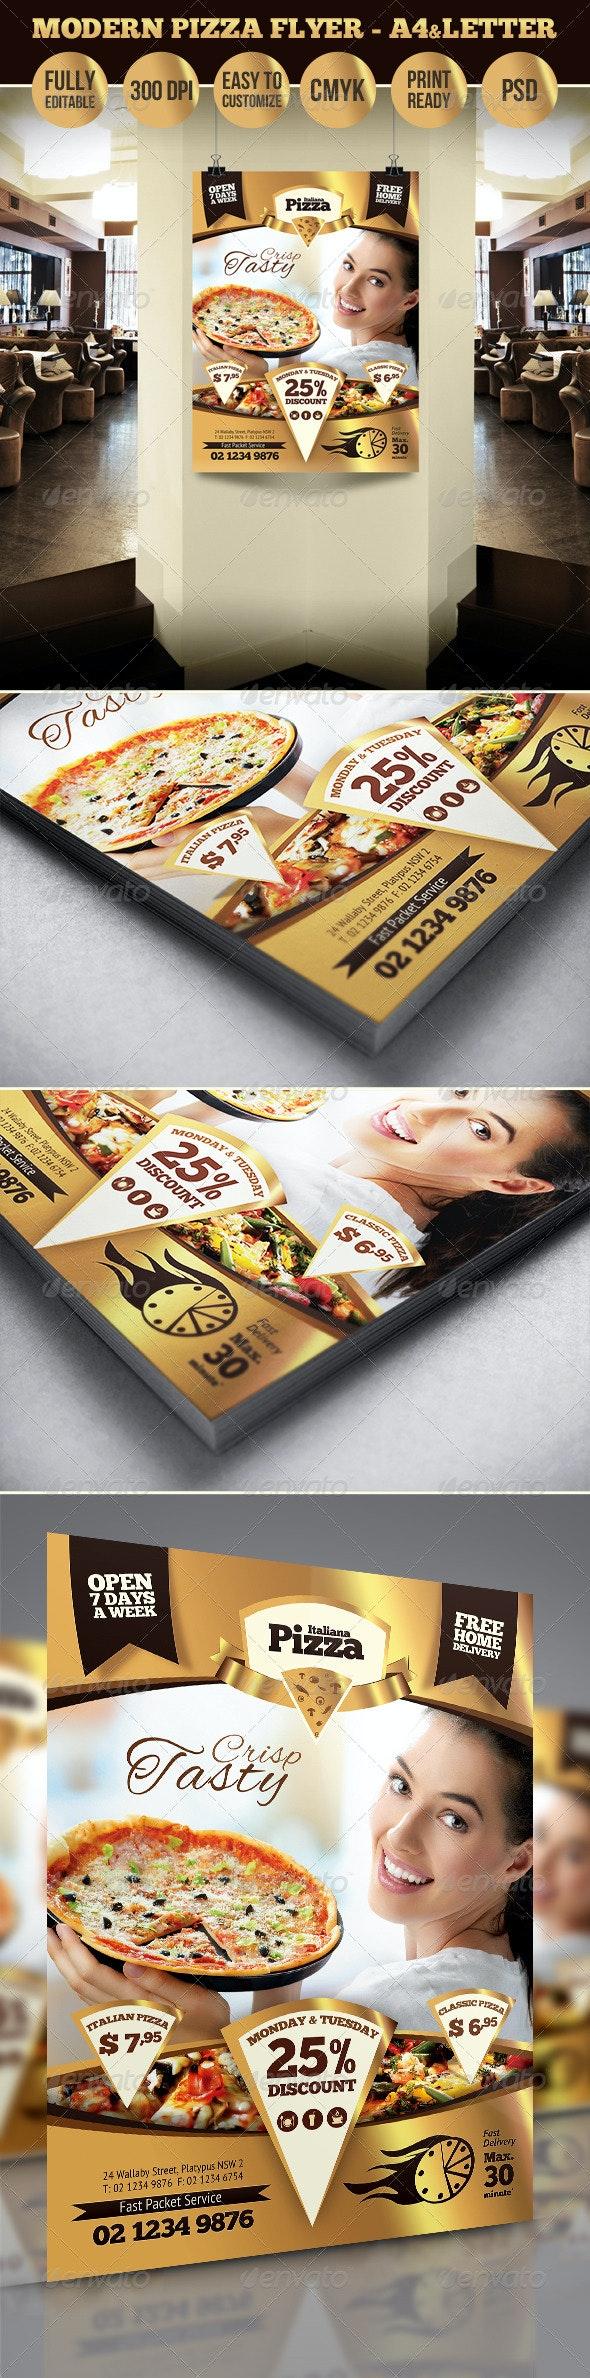 Modern Pizza Flyer - A4 & Letter Sizes - Restaurant Flyers